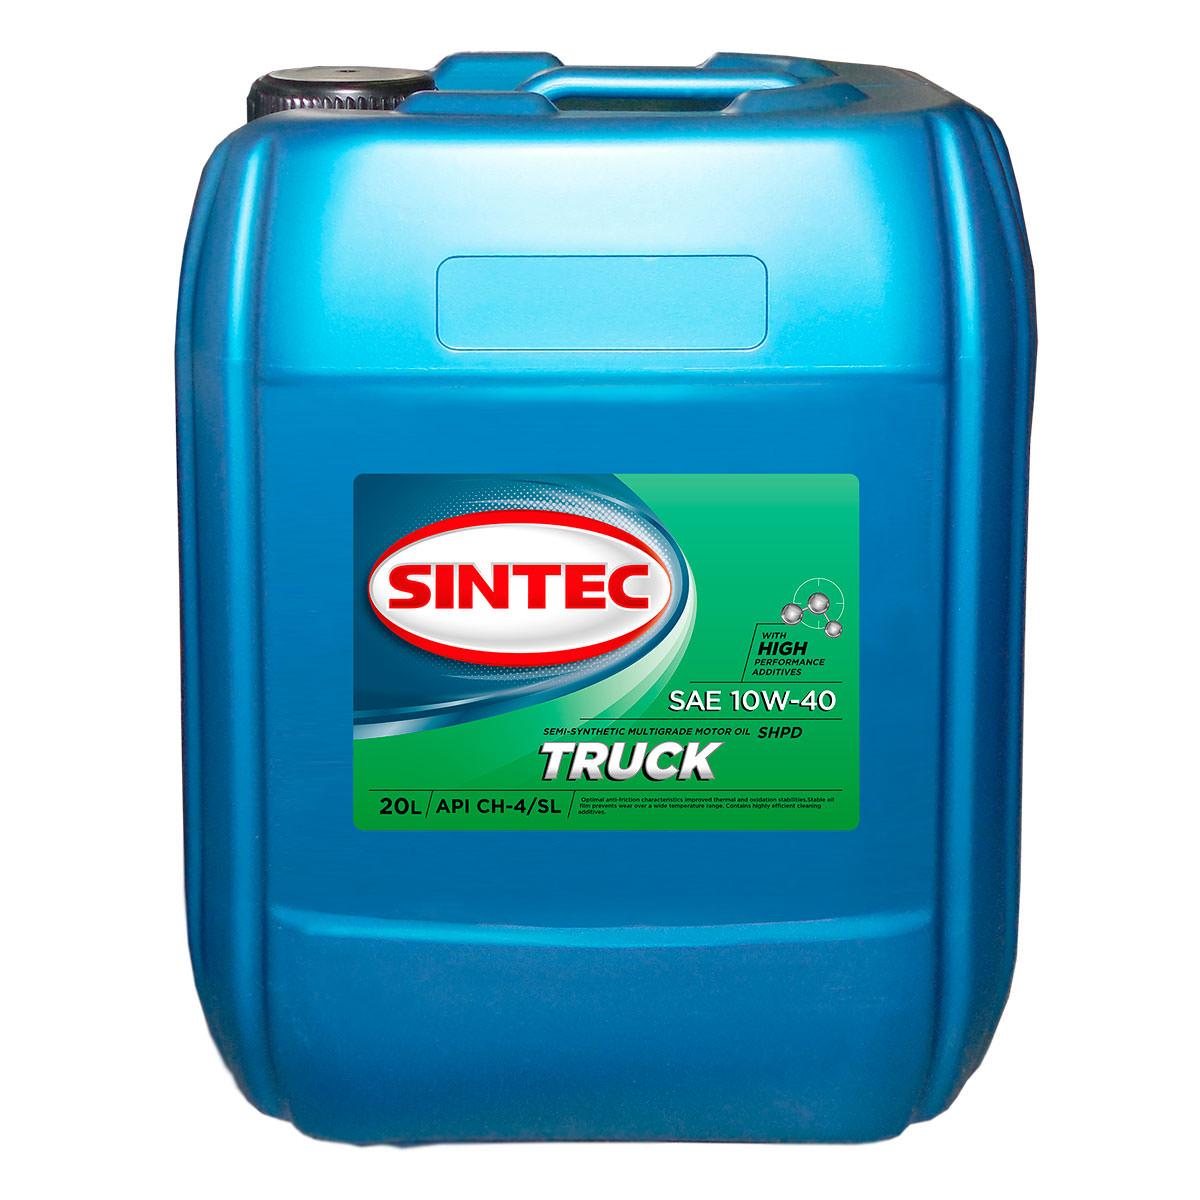 SINTEC TRUCK SAE 10W-40 API CH-4/SL